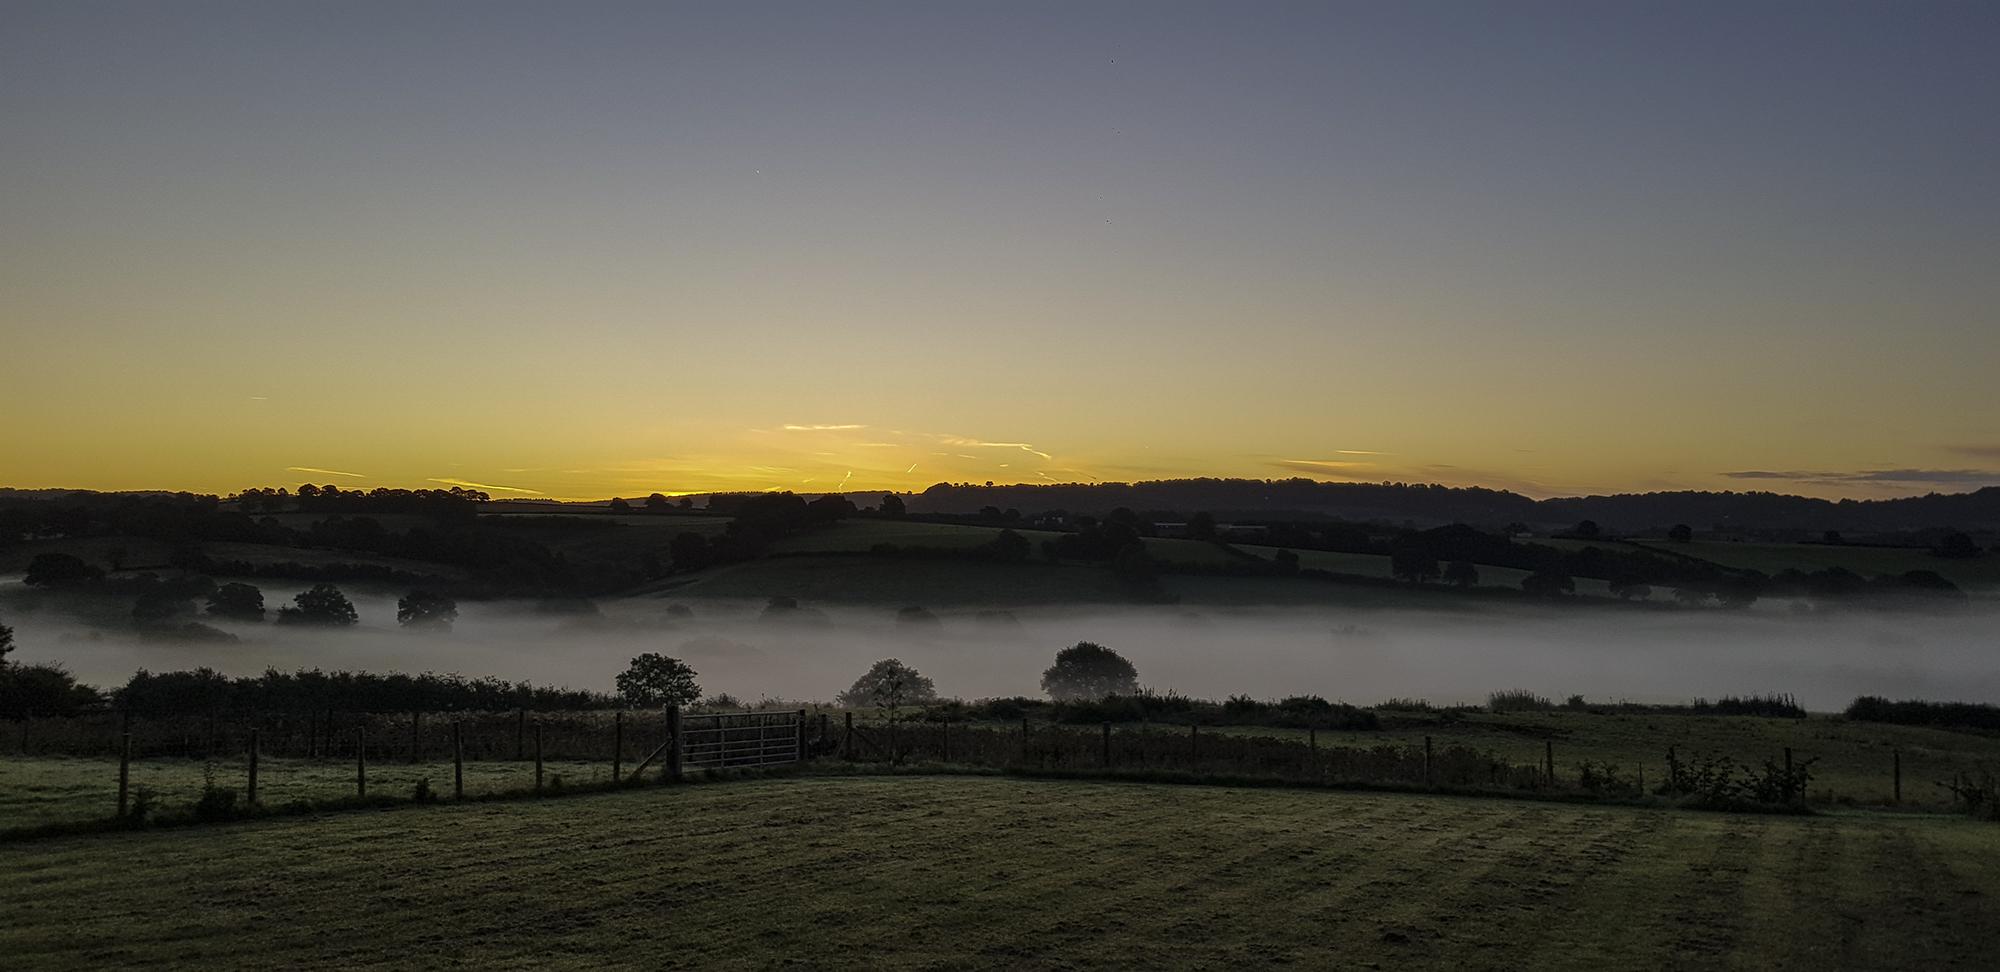 6am mist filled valley, Usk, Wales